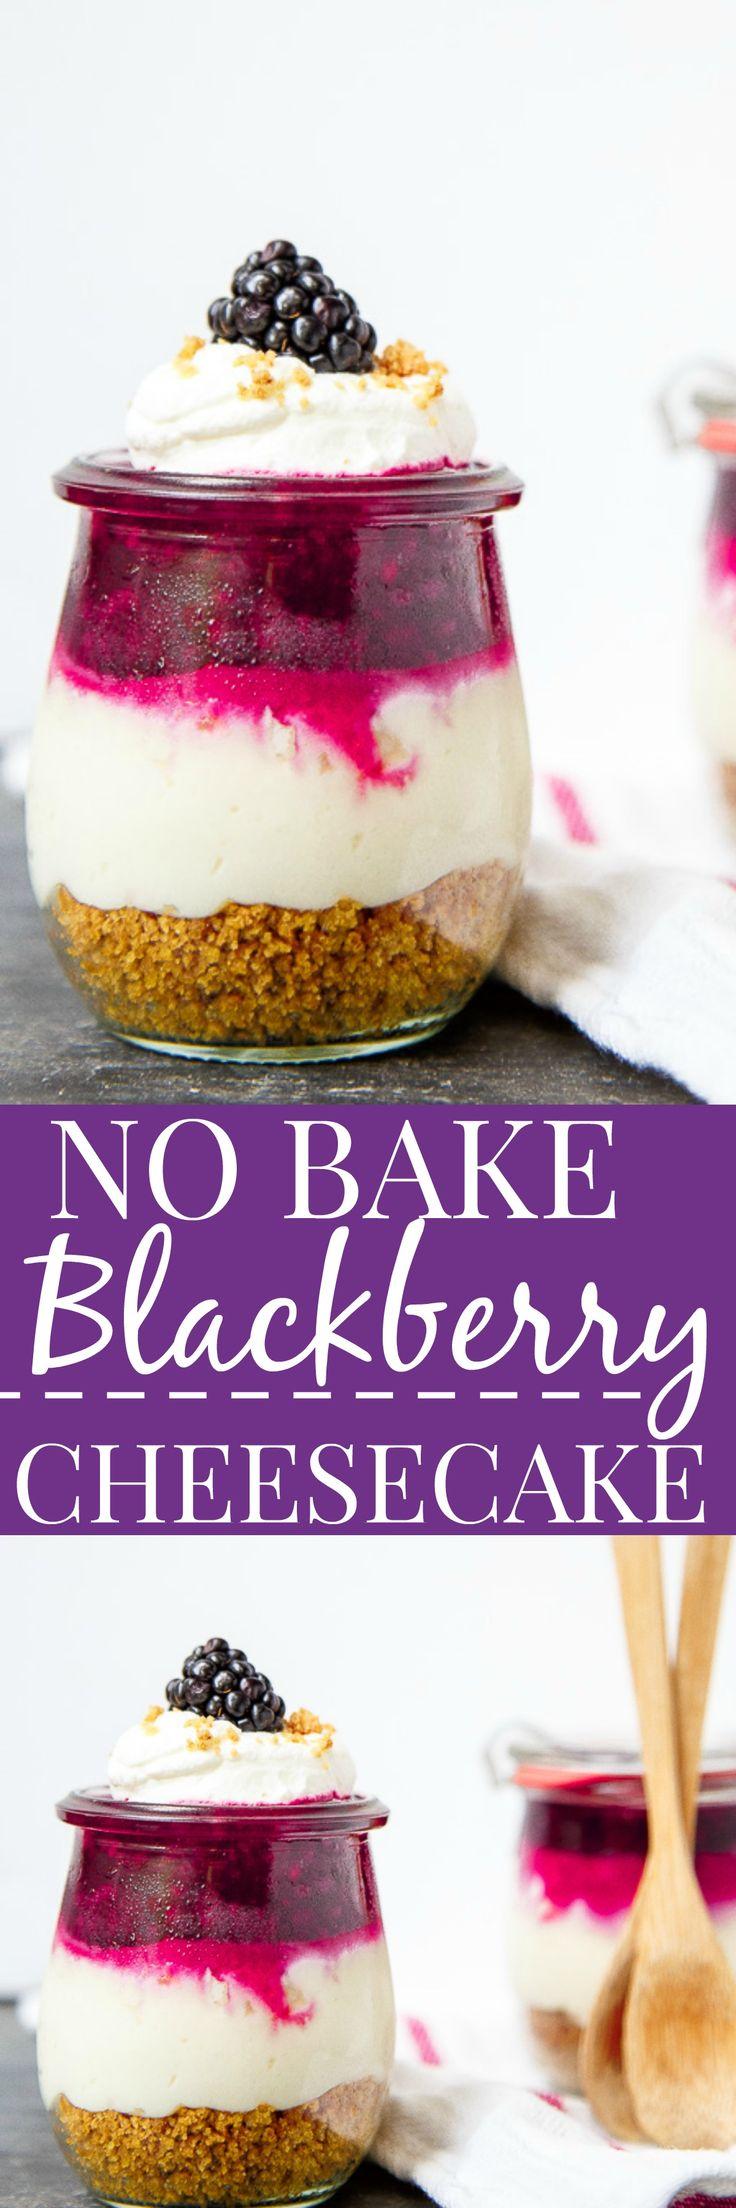 No bake cheesecakes in jars! Easy portable dessert idea for summer picnics. @DessertForTwo